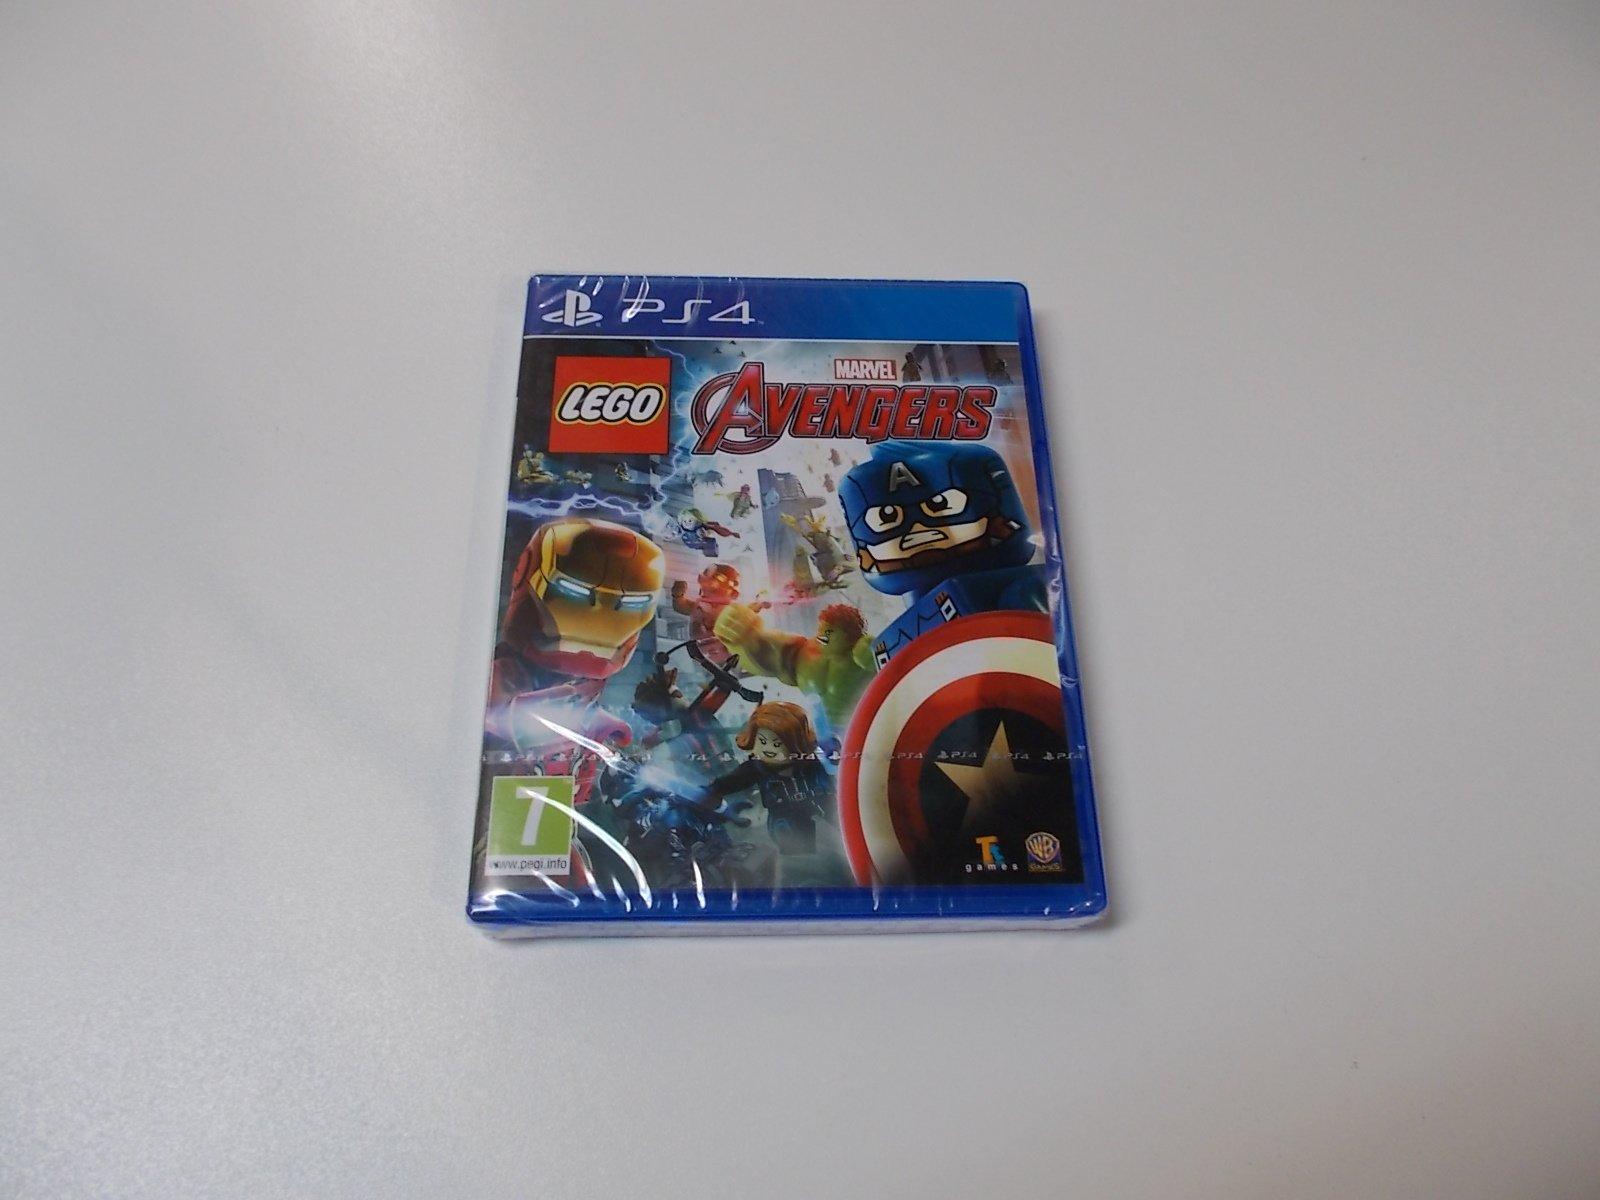 LEGO Marvel Avengers - GRA Ps4 - Opole 0484